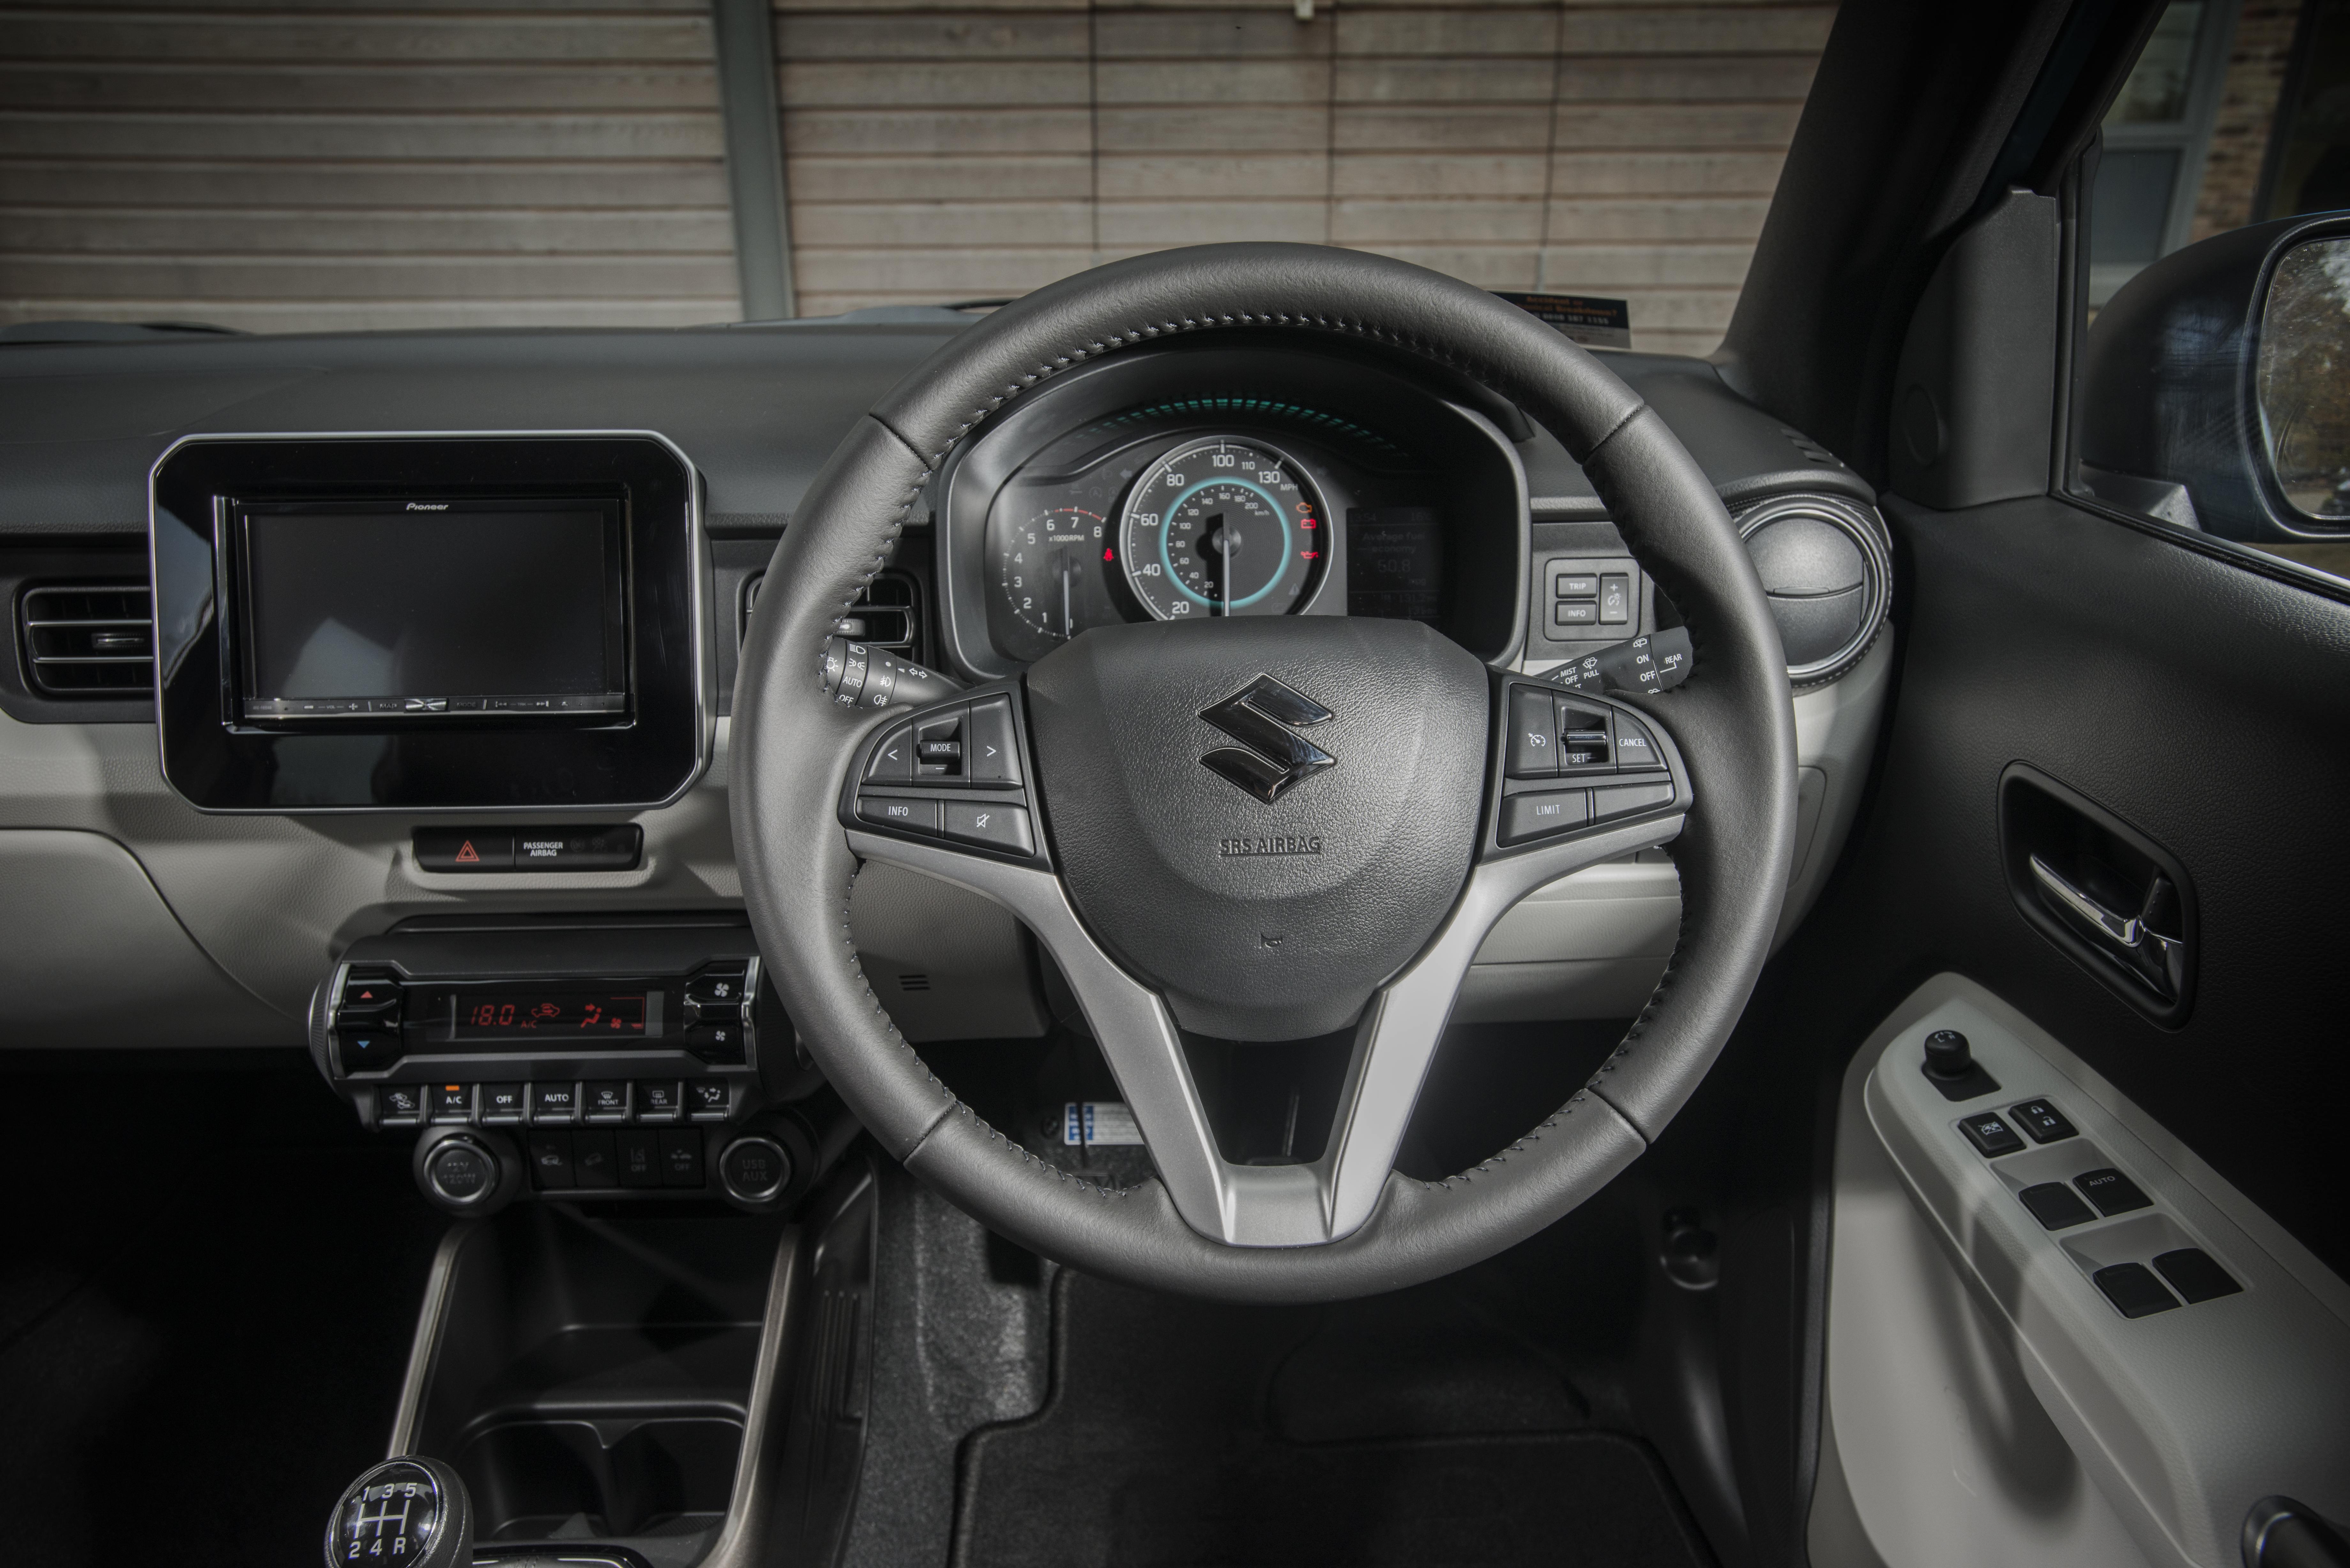 Suzuki Ignis Driver's Seat